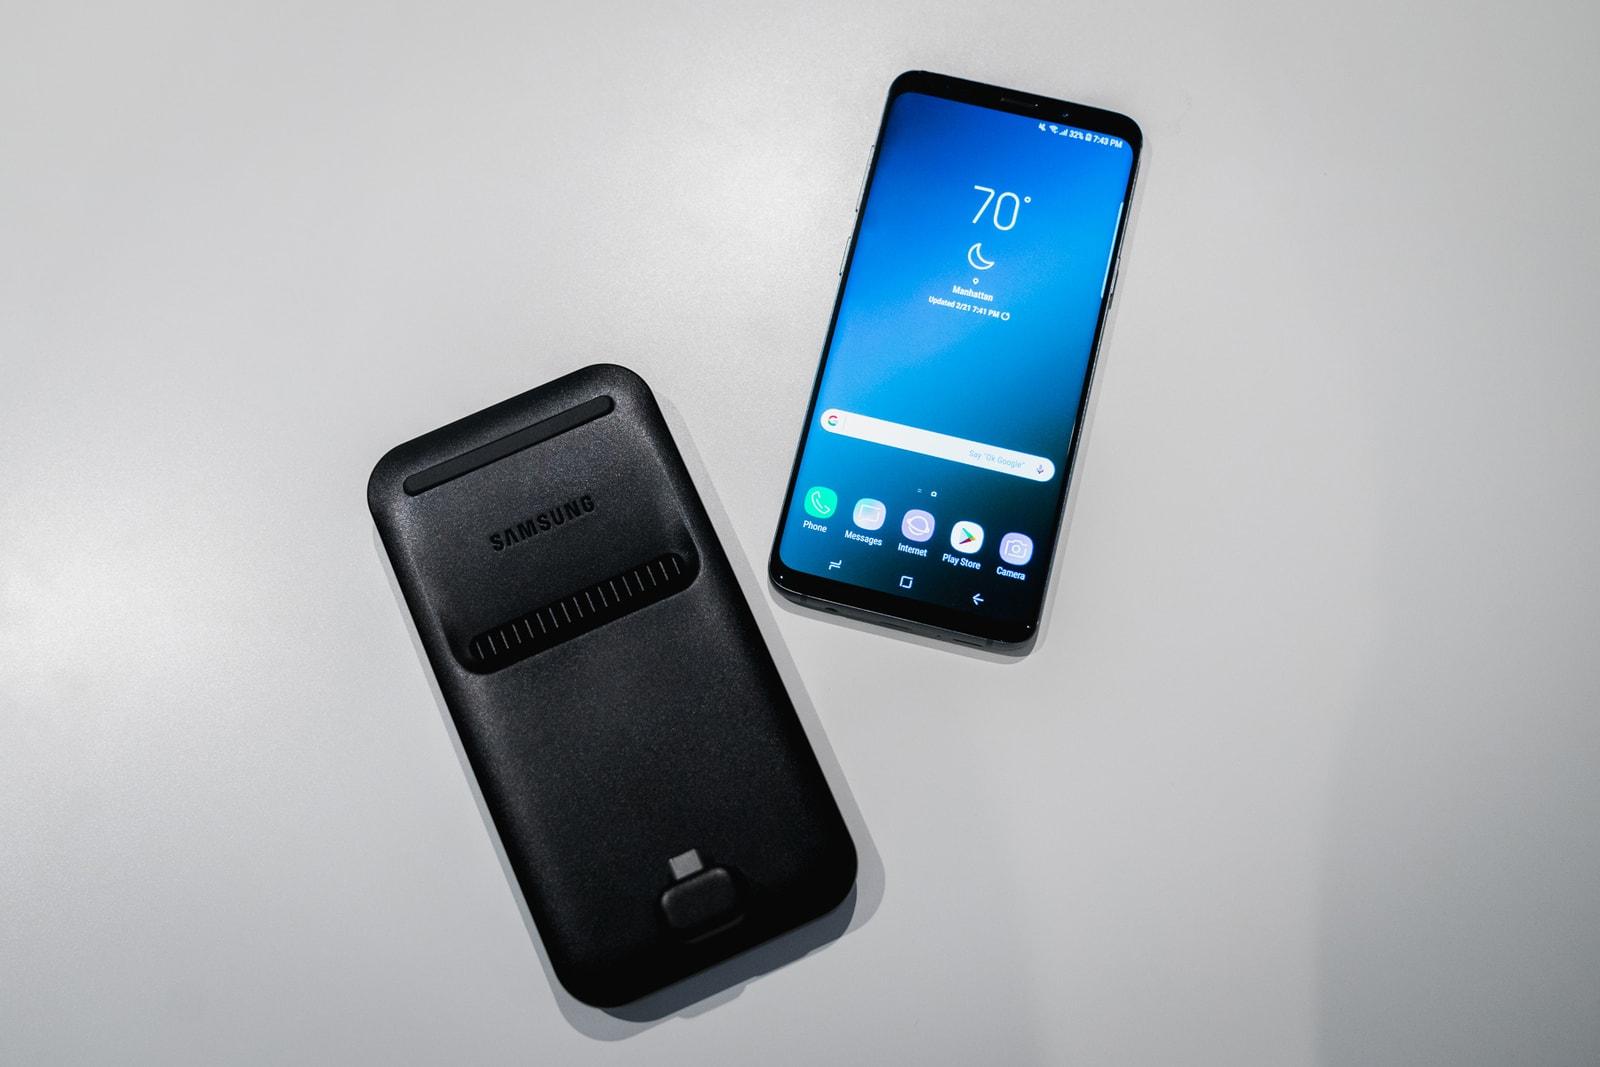 Samsung Galaxy S9 S9+ Apple iPhone X Android iOS Camera Super Slo Mo AR Emoji Animoji Photography Mobile Phone Cell Phone DeX Entertainment